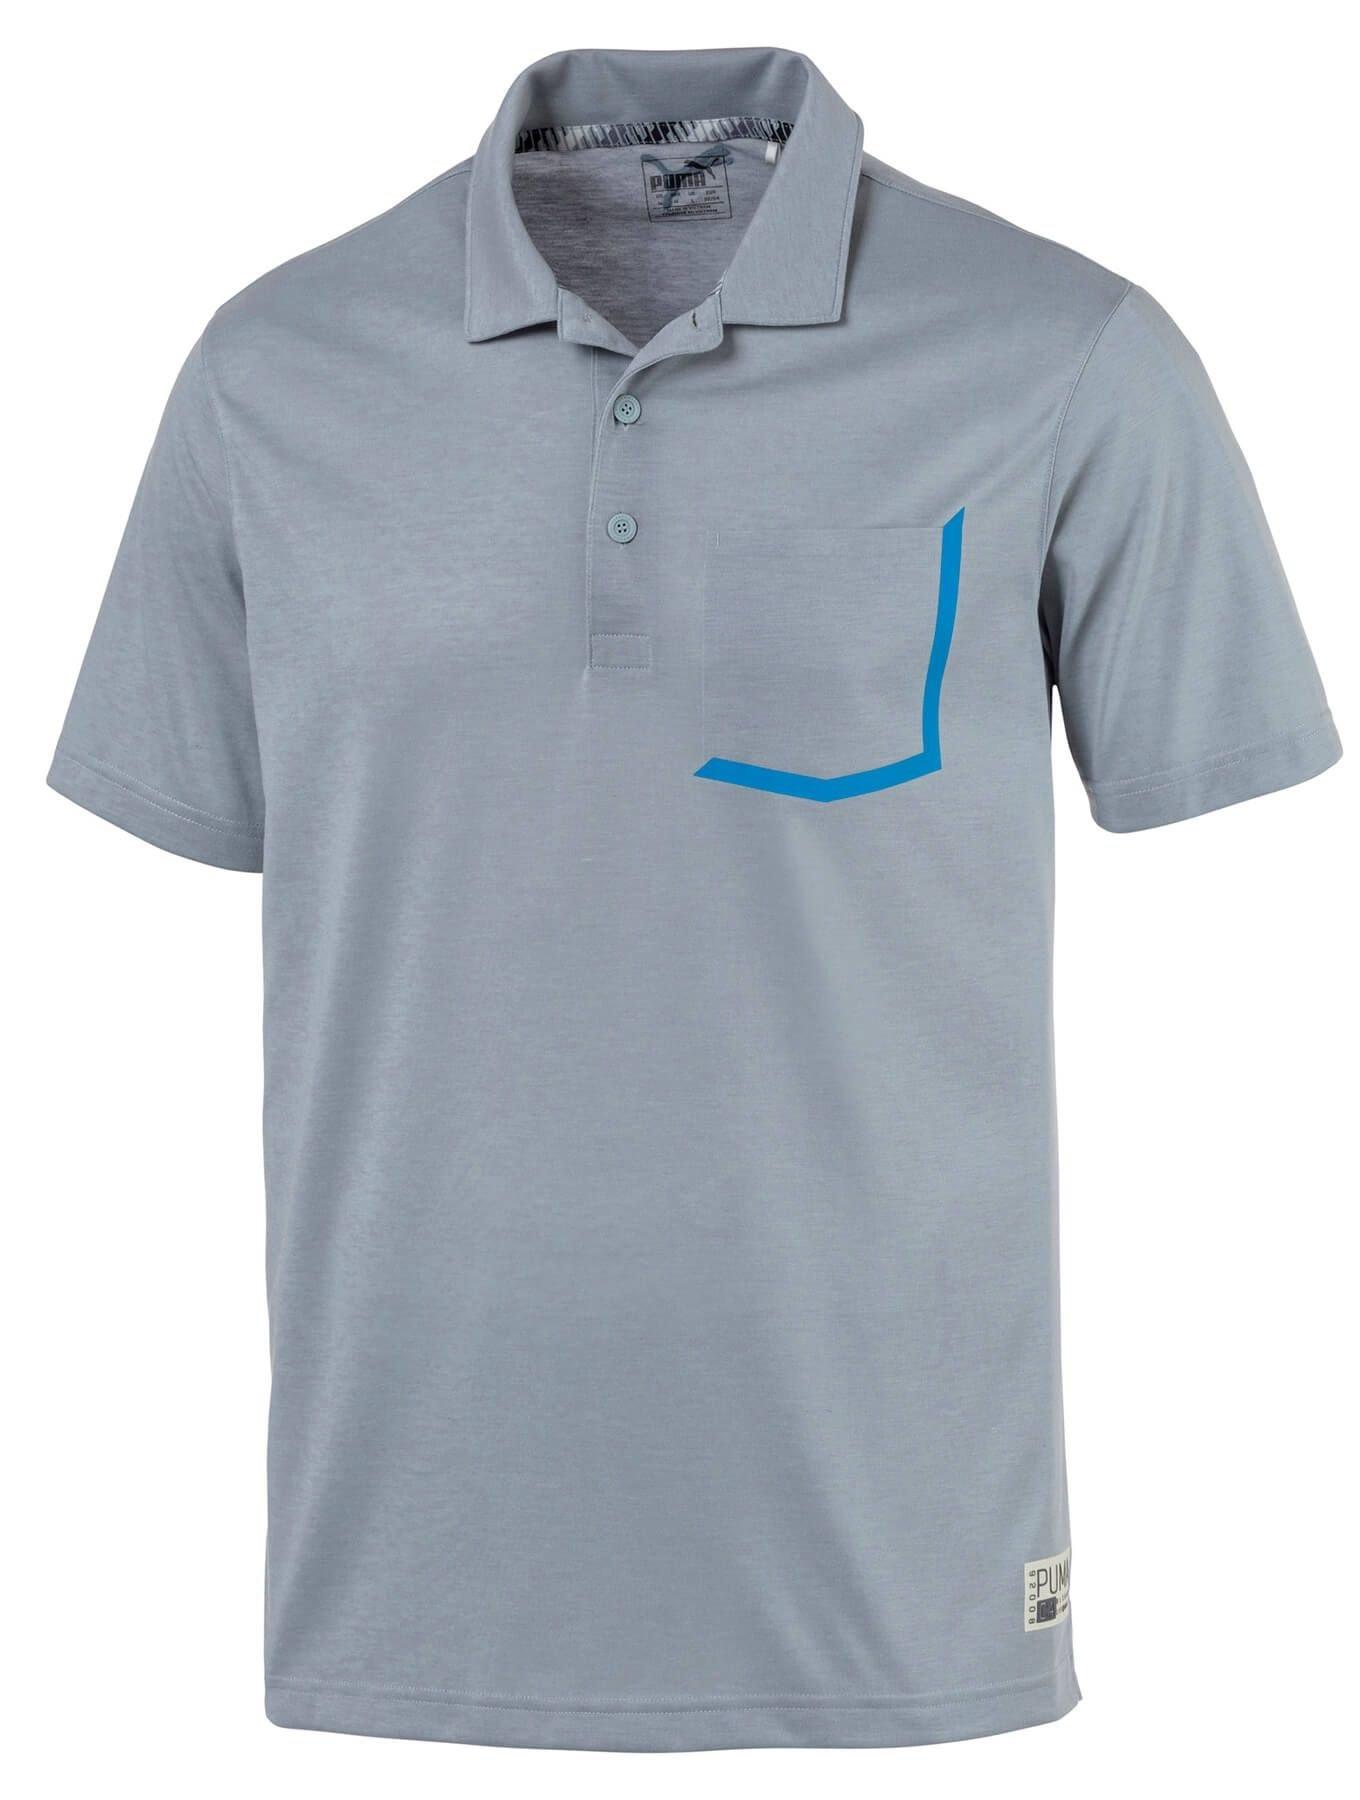 Puma Faraday Golf Polo Shirt - ON SALE